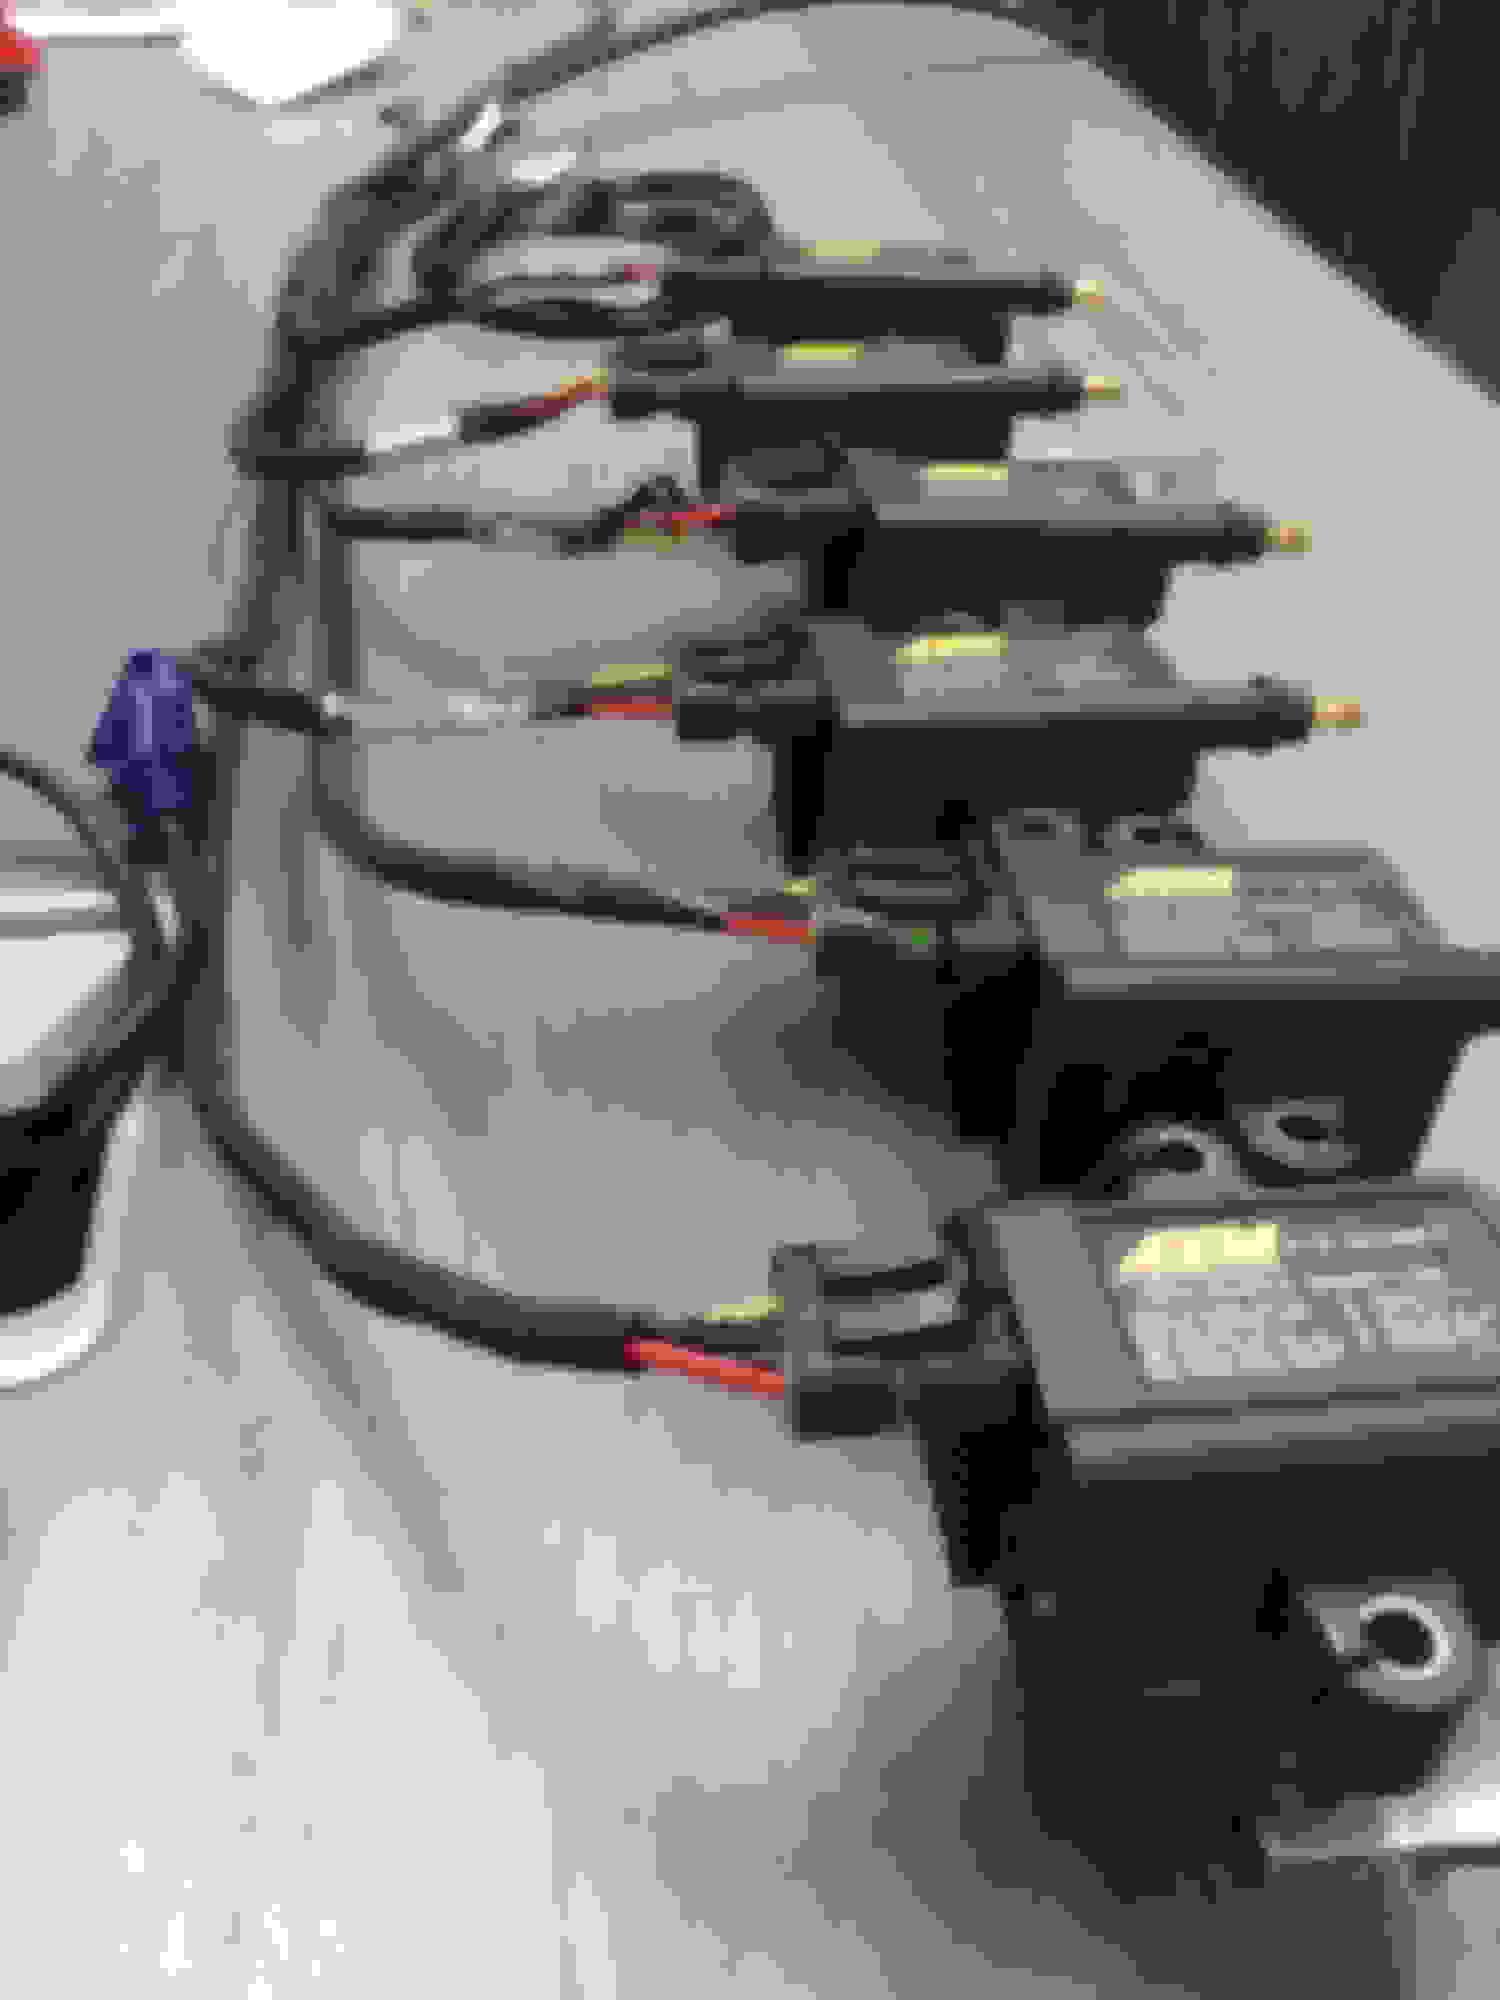 LSx coil thread - Page 7 - Miata Turbo Forum - Boost cars